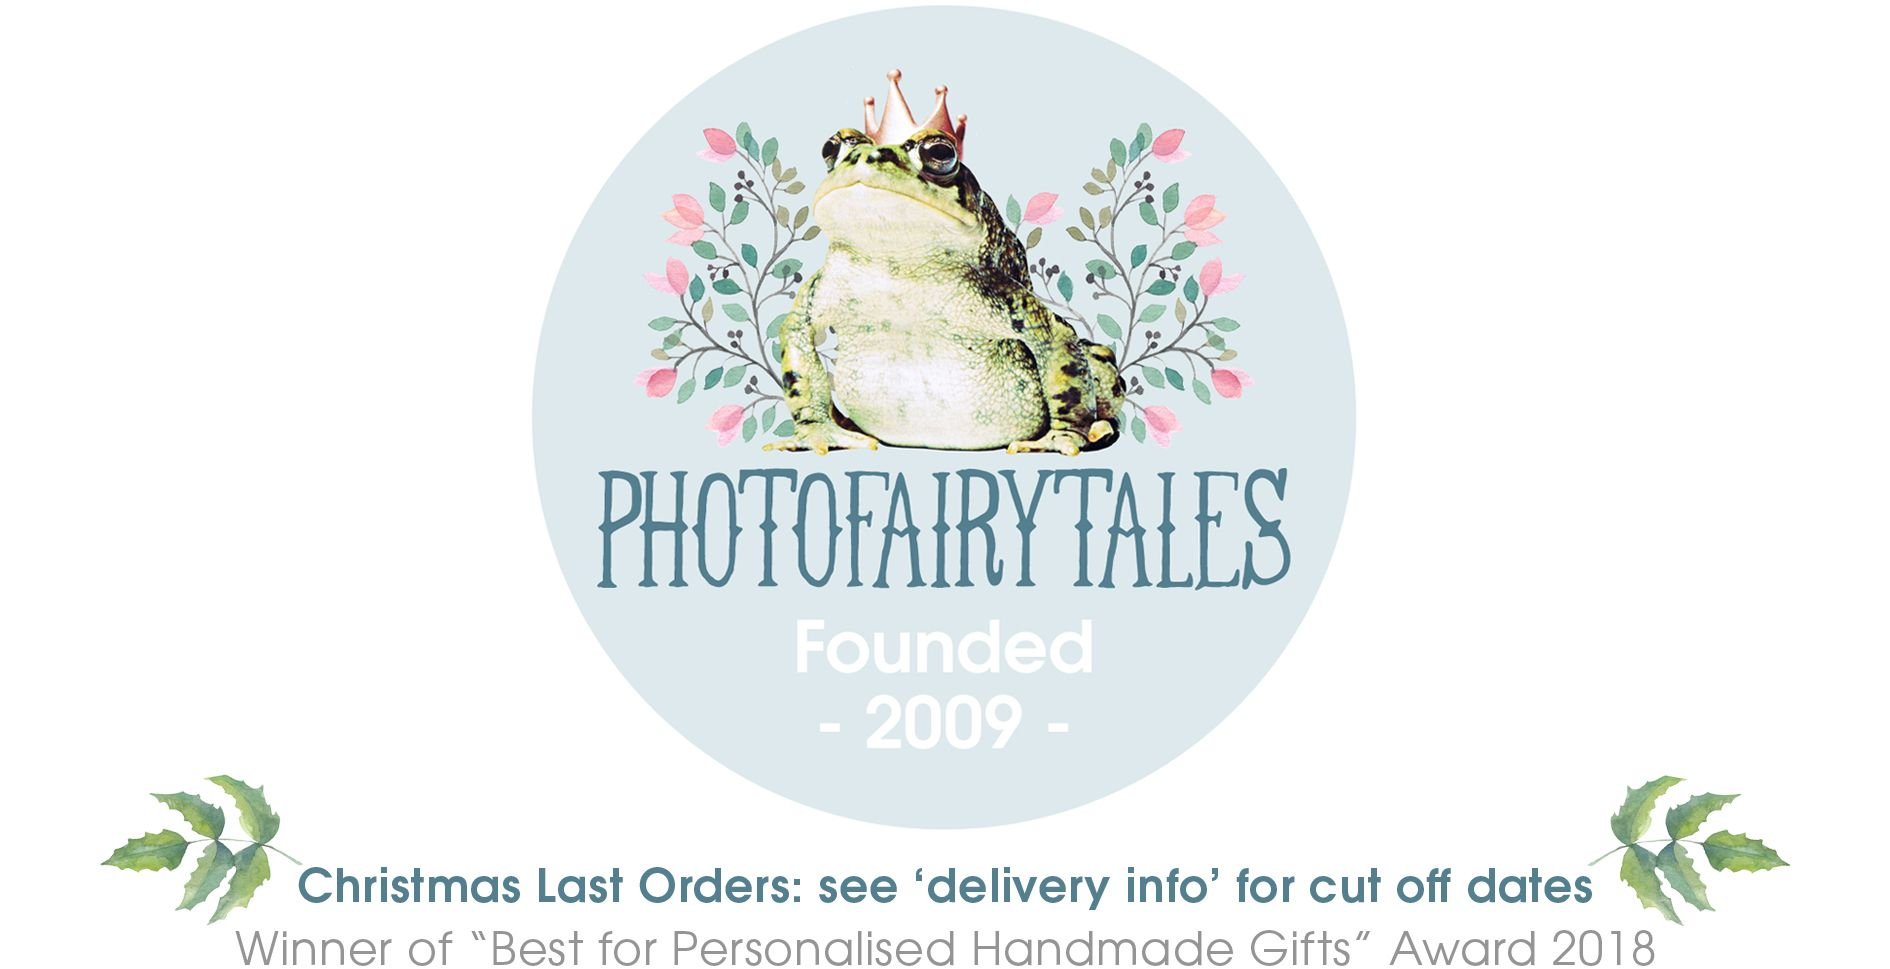 PhotoFairytales | personalised, handmade, unique gifts and keepsakes